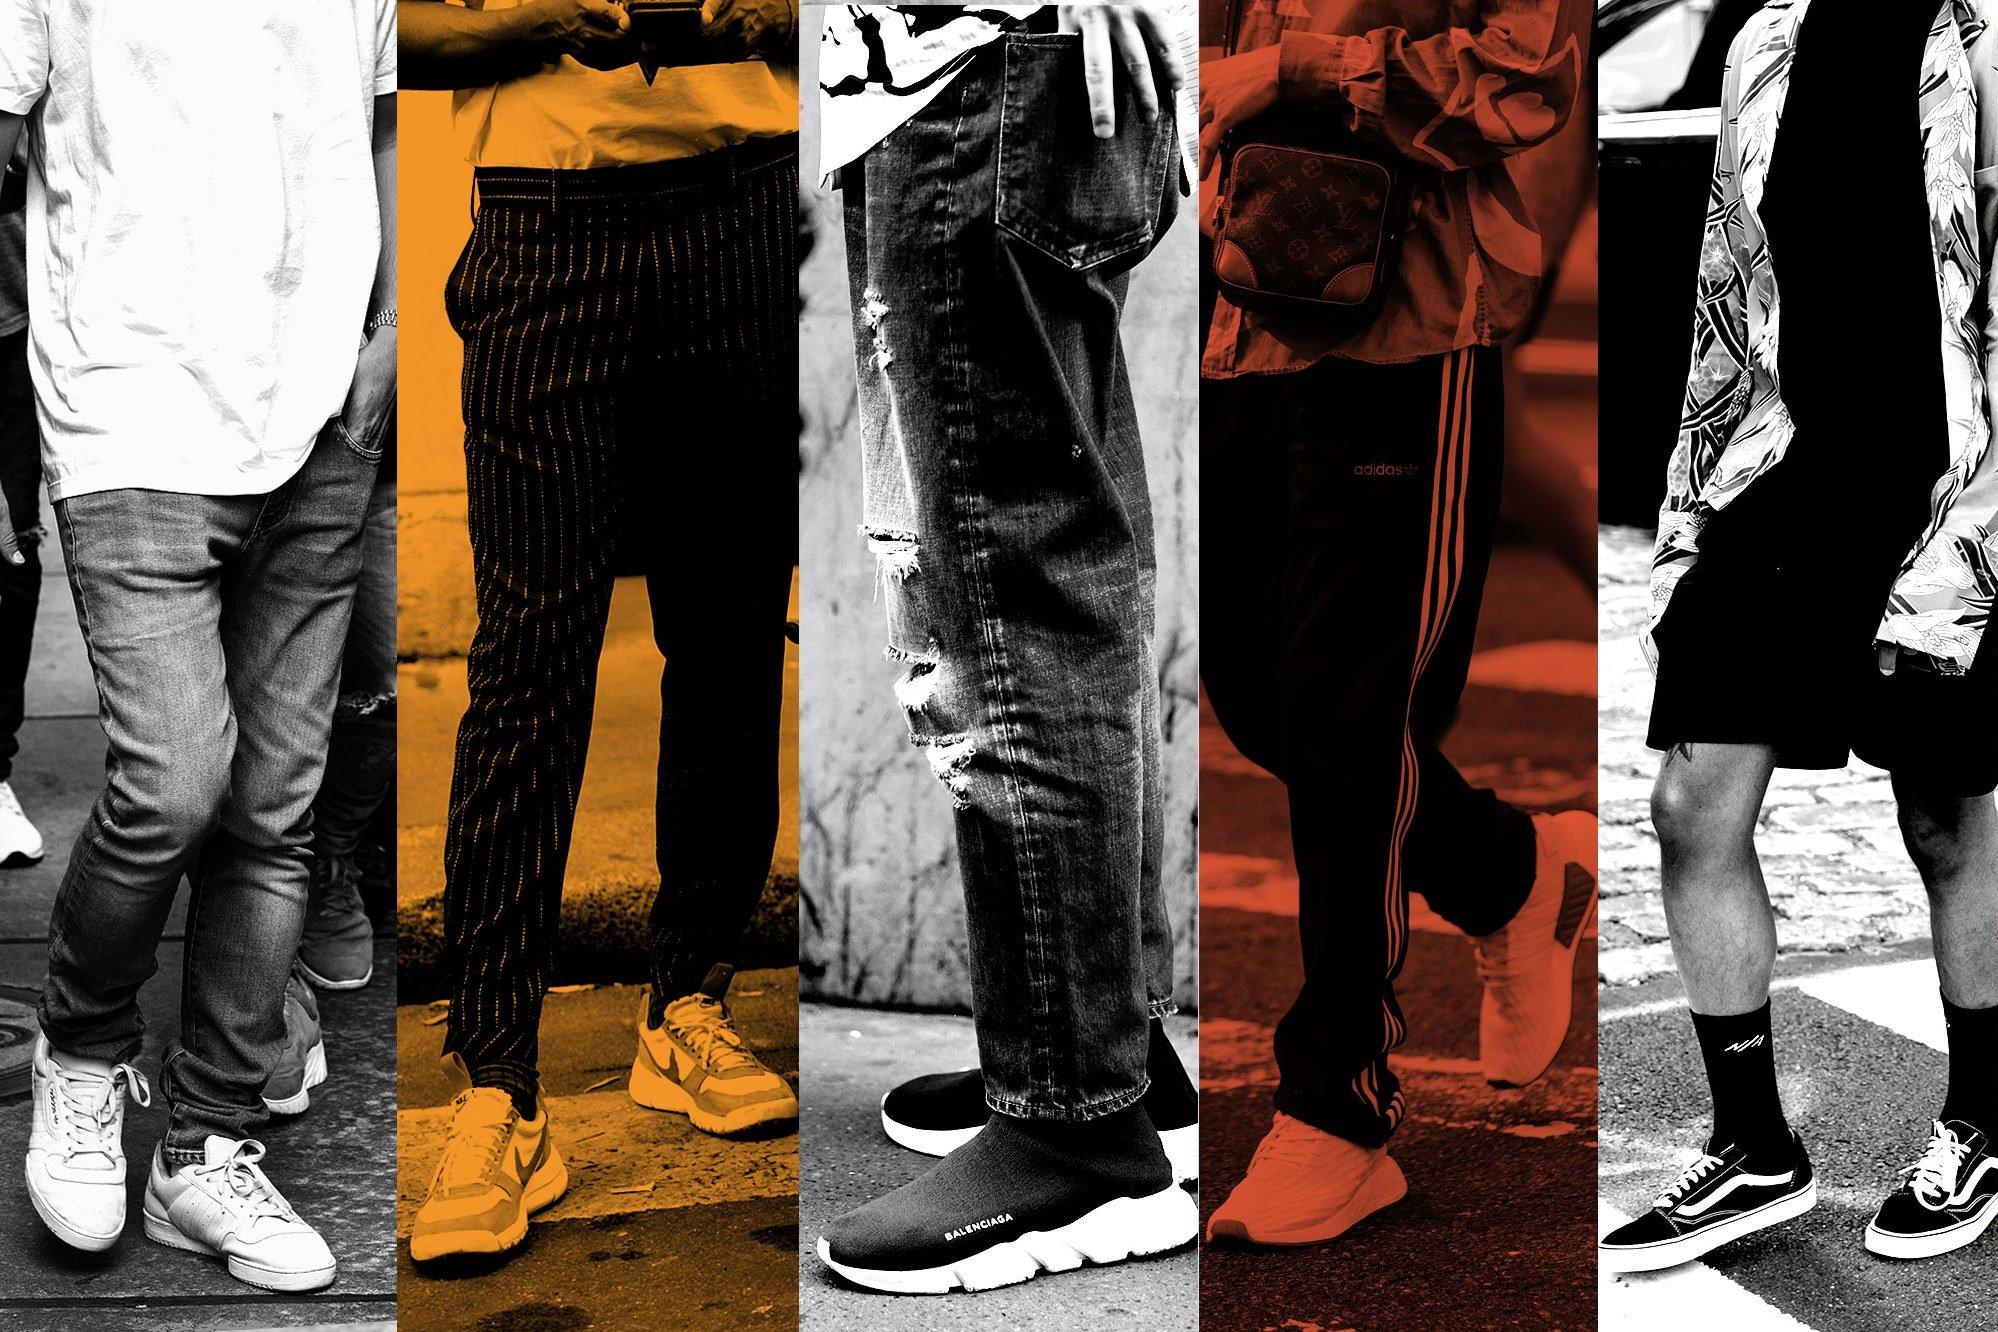 Quần adidas, áo adidas, áo thun adidas, quần dài adidas